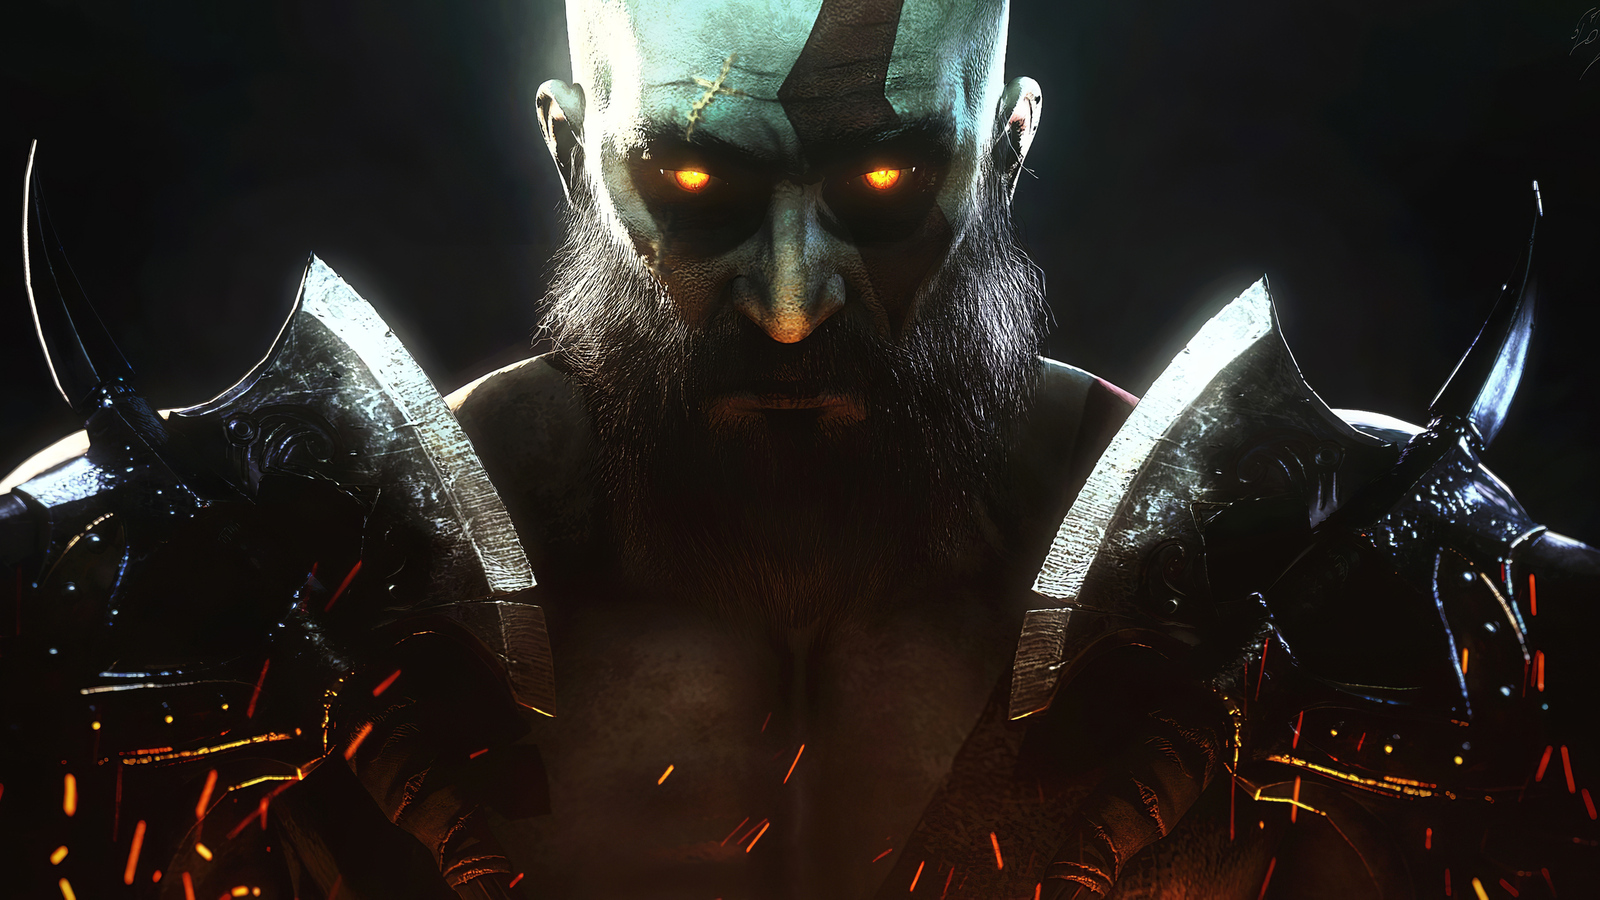 ghost-of-sparta-god-of-war-m1.jpg